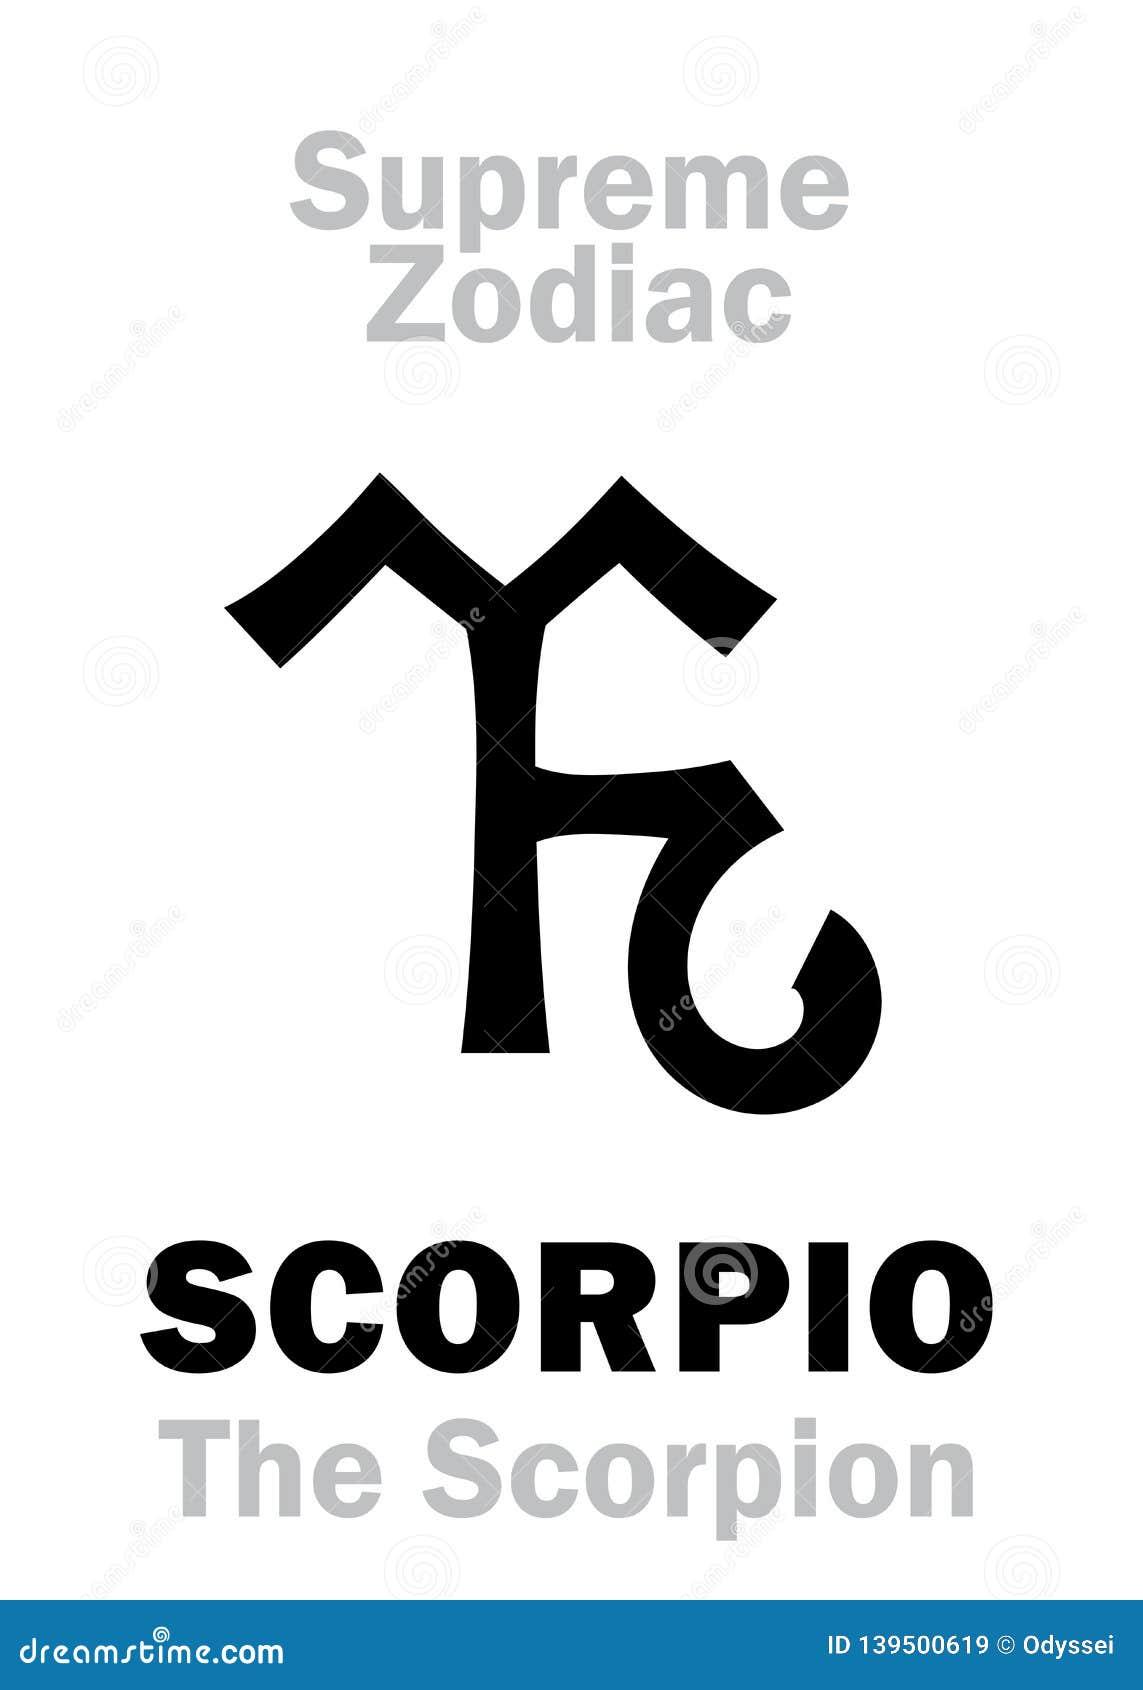 Astrology: Supreme Zodiac: SCORPIO (The Scorpion) Stock